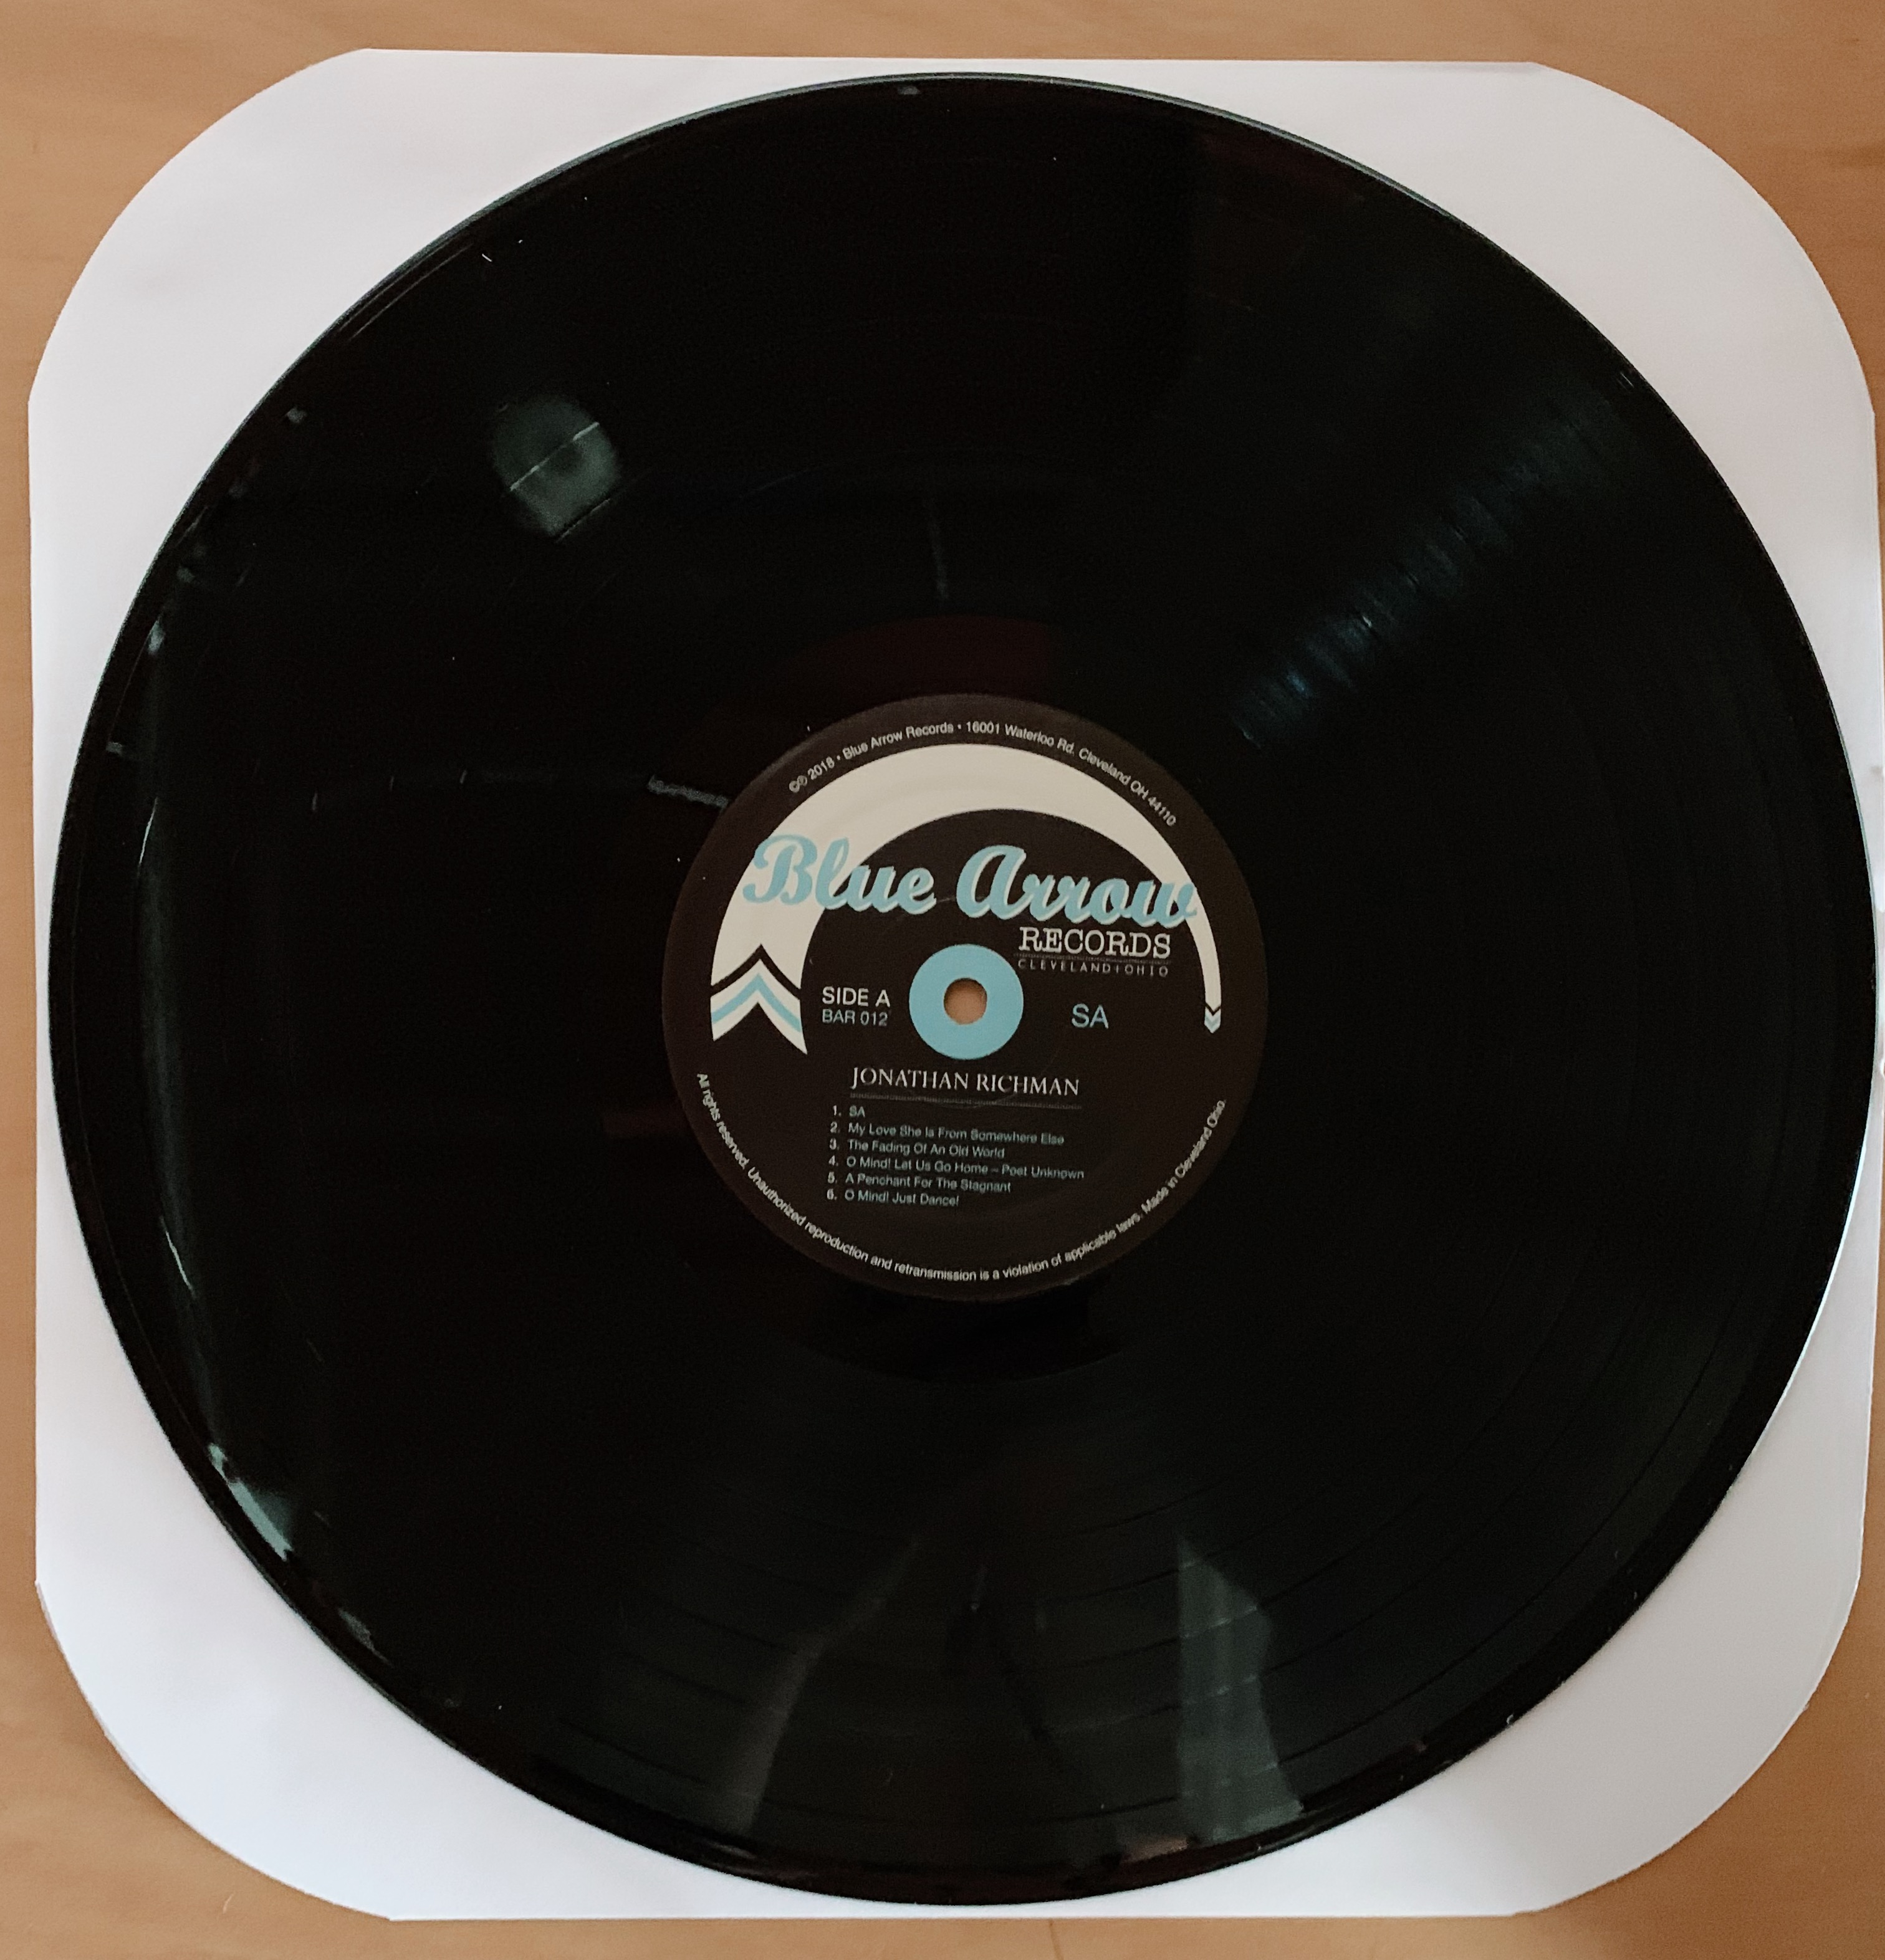 Sa Lp W Download Code Blue Arrow Records